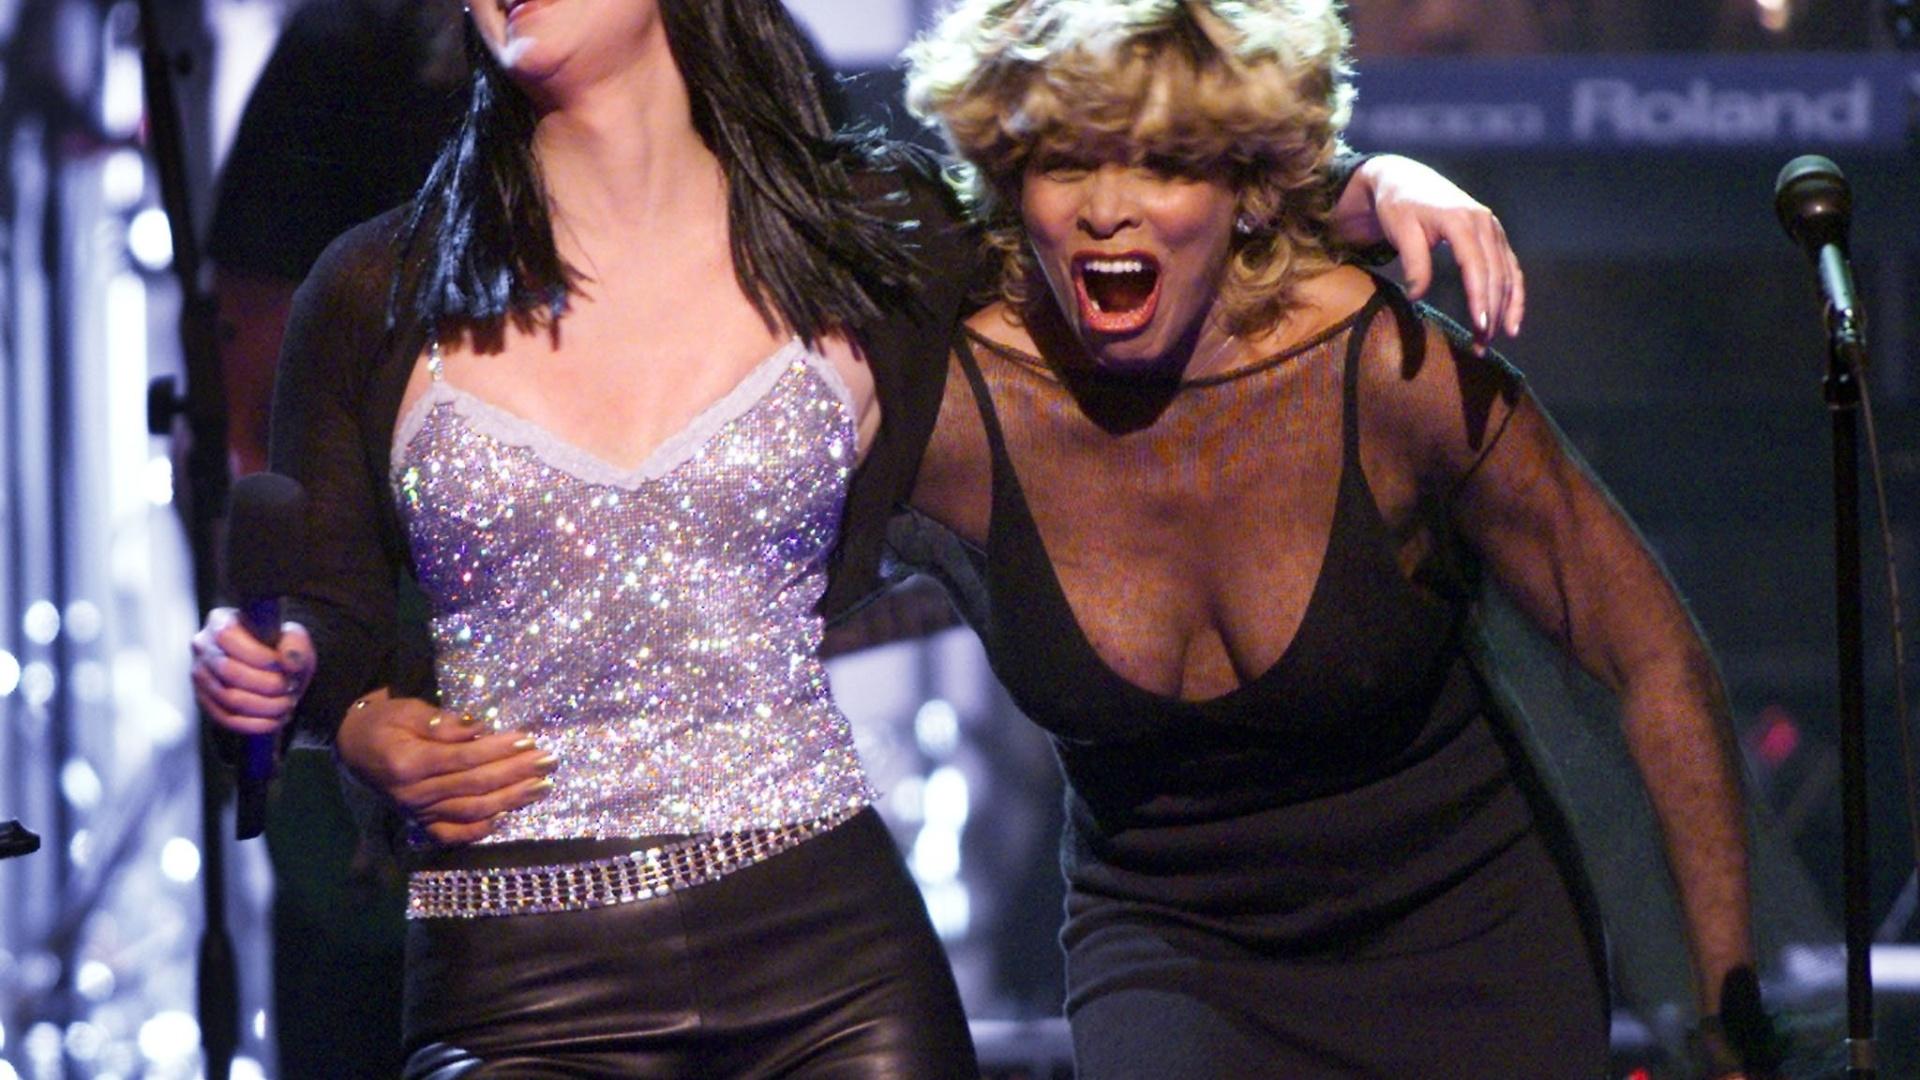 Tina Turner se apresenta junto com Cher no showTina Turner Bruised Face